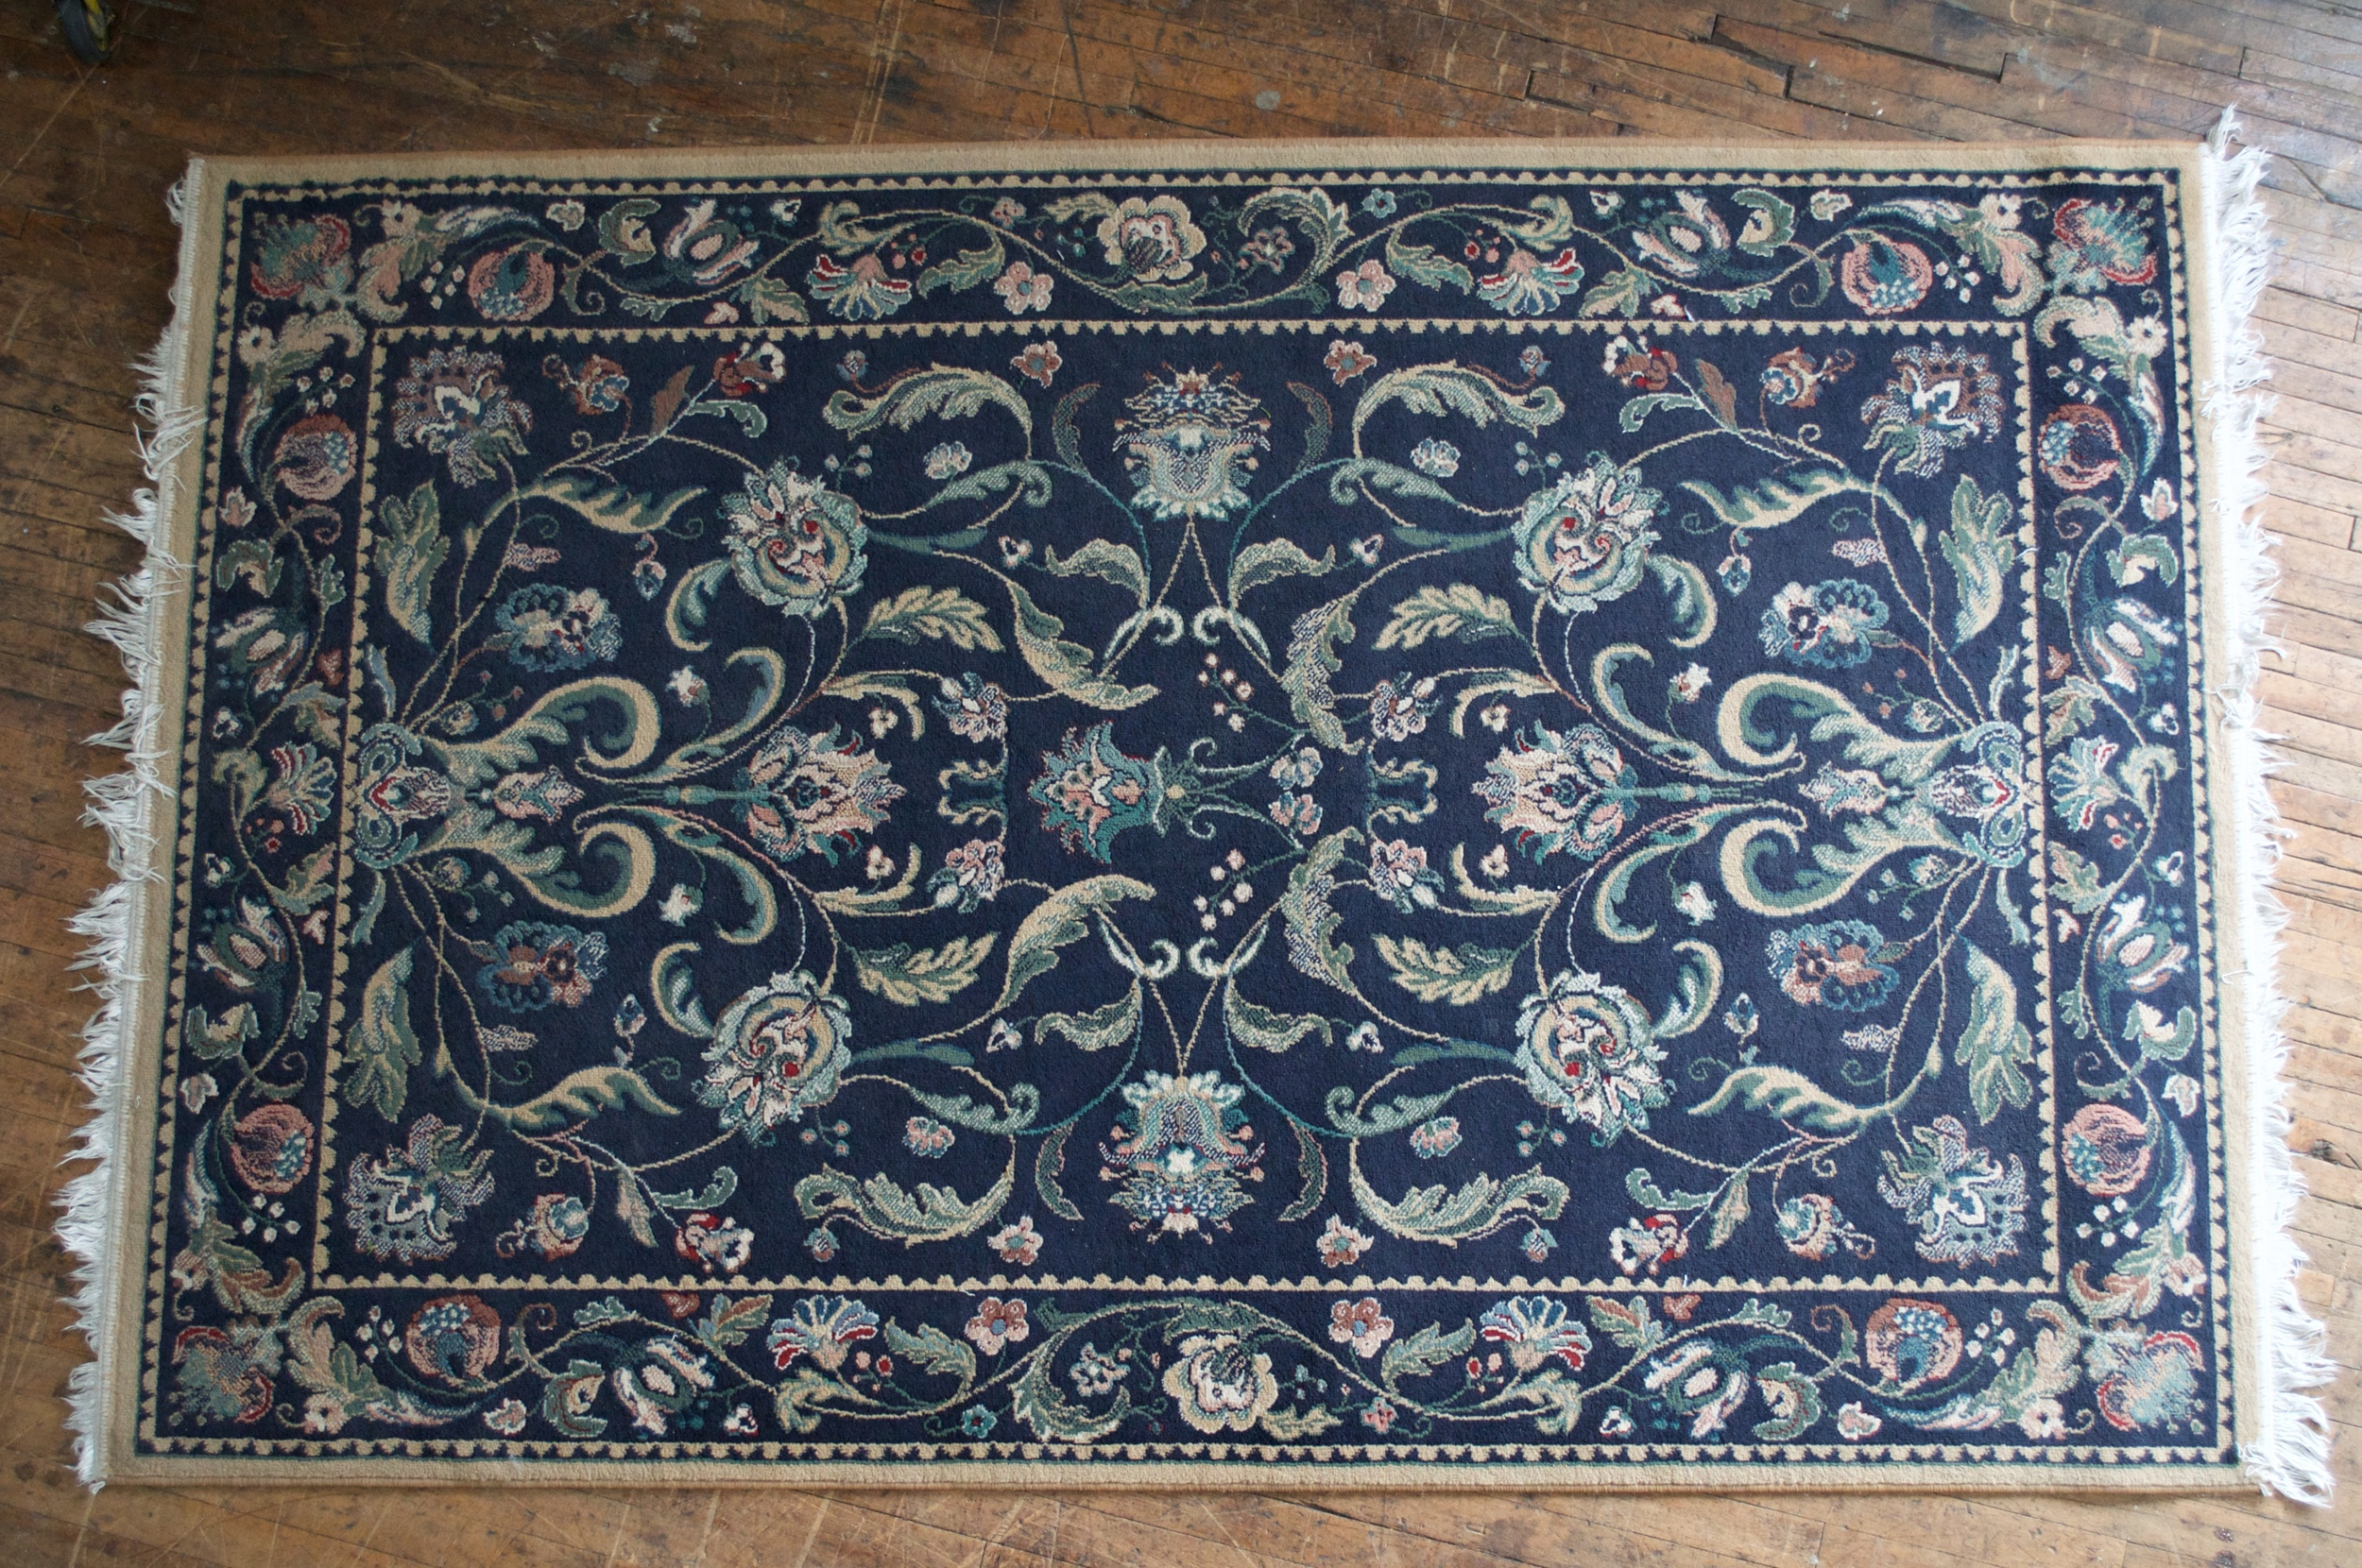 Blue Area Rug (8 x 5) $48